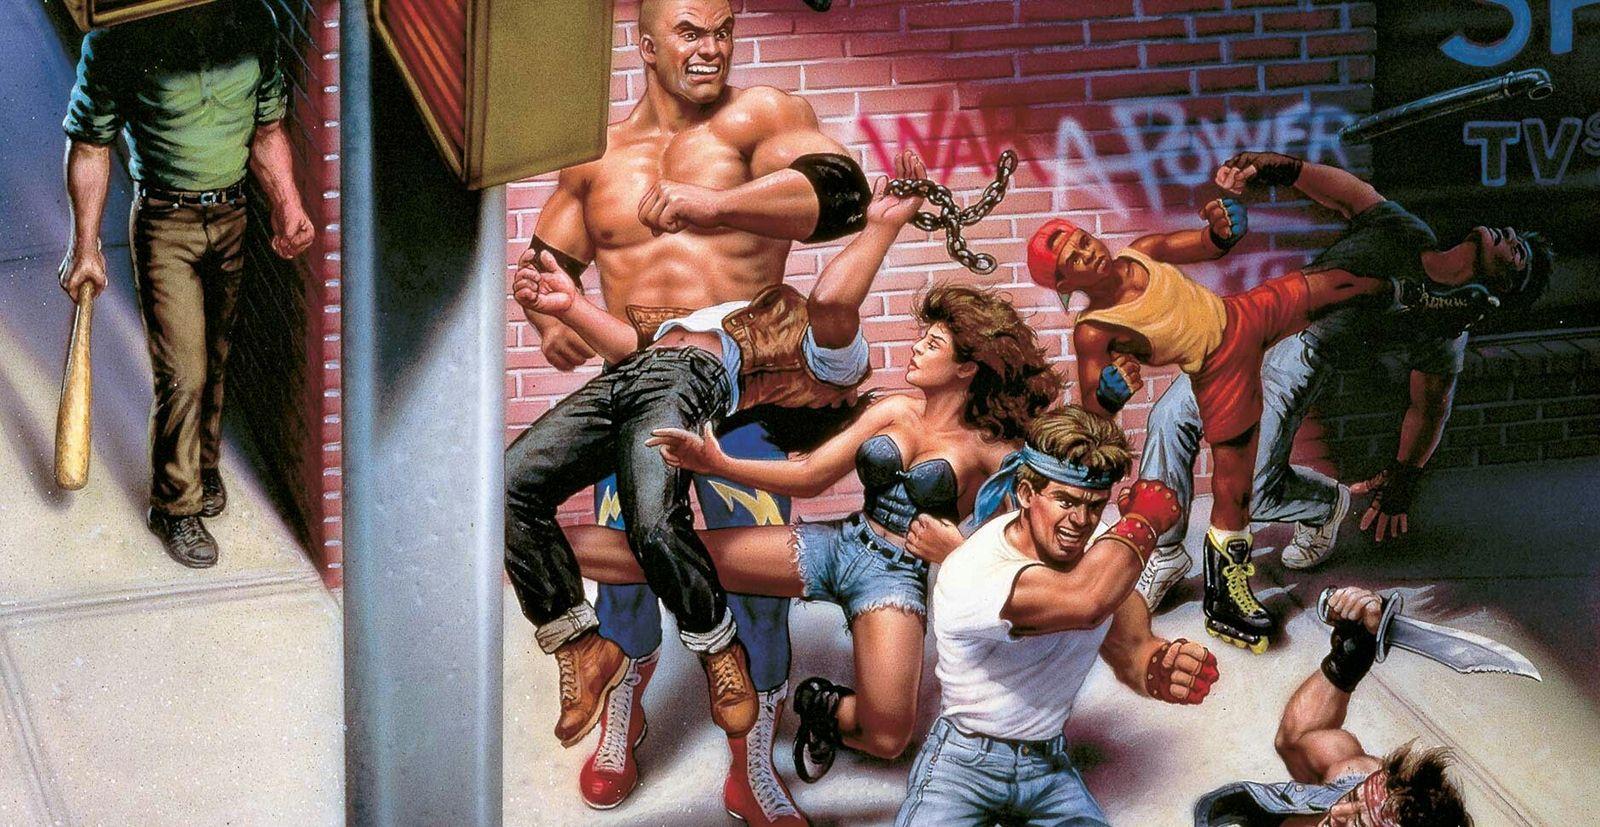 L'illustrateur Mick McGinty (Streets of Rage 2, Street Fighter II, Kid Chameleon...) est décédé